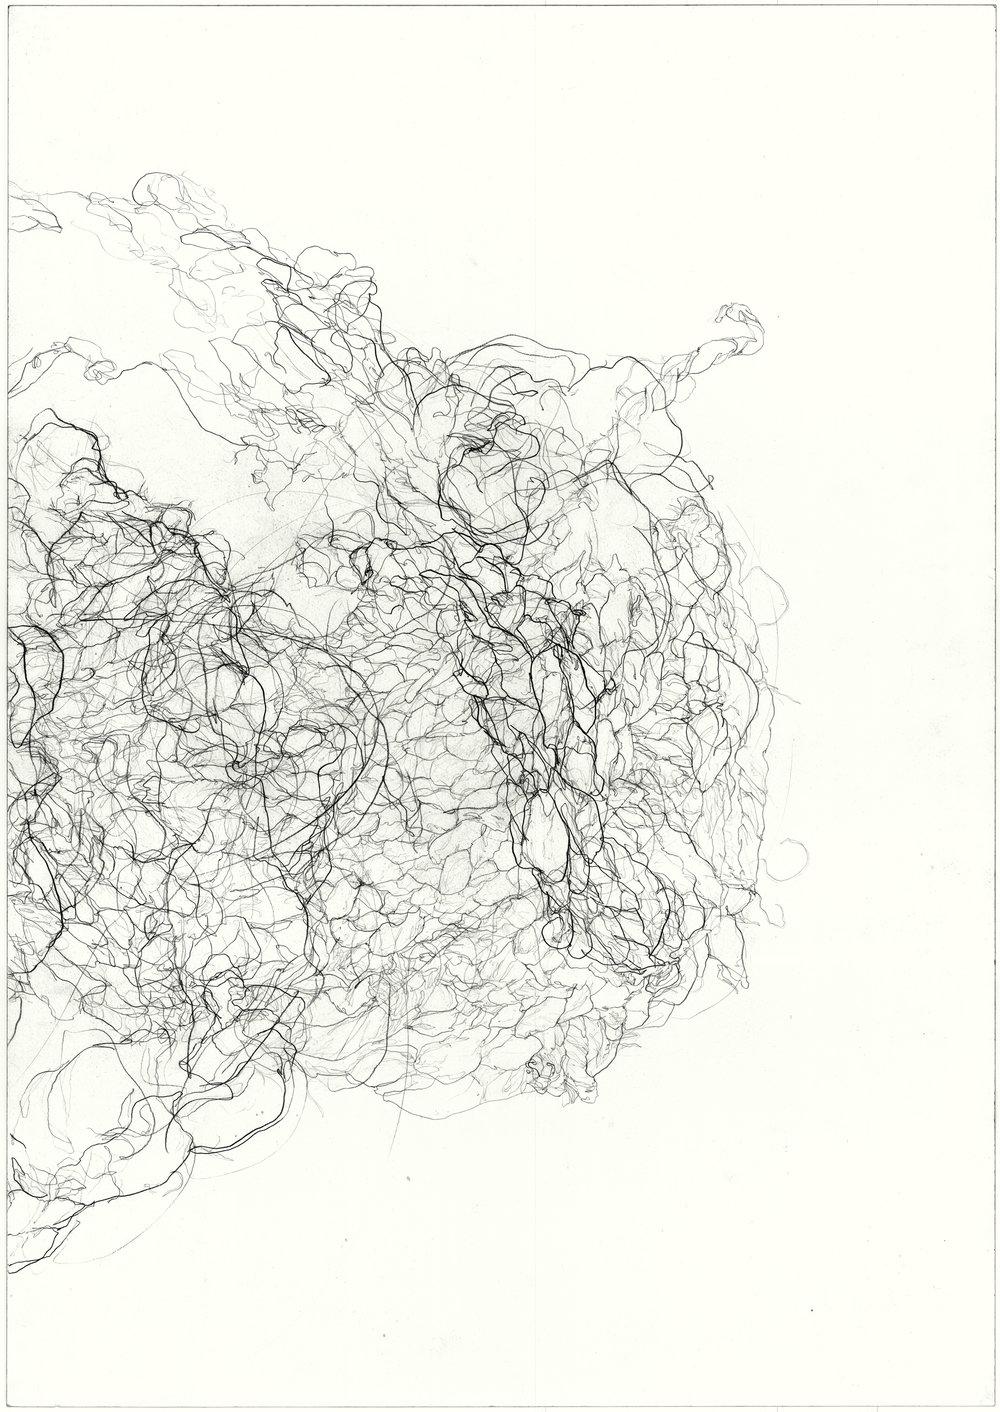 Strangle  2011, pencil on paper, 84.1 cm x 59.5 cm.